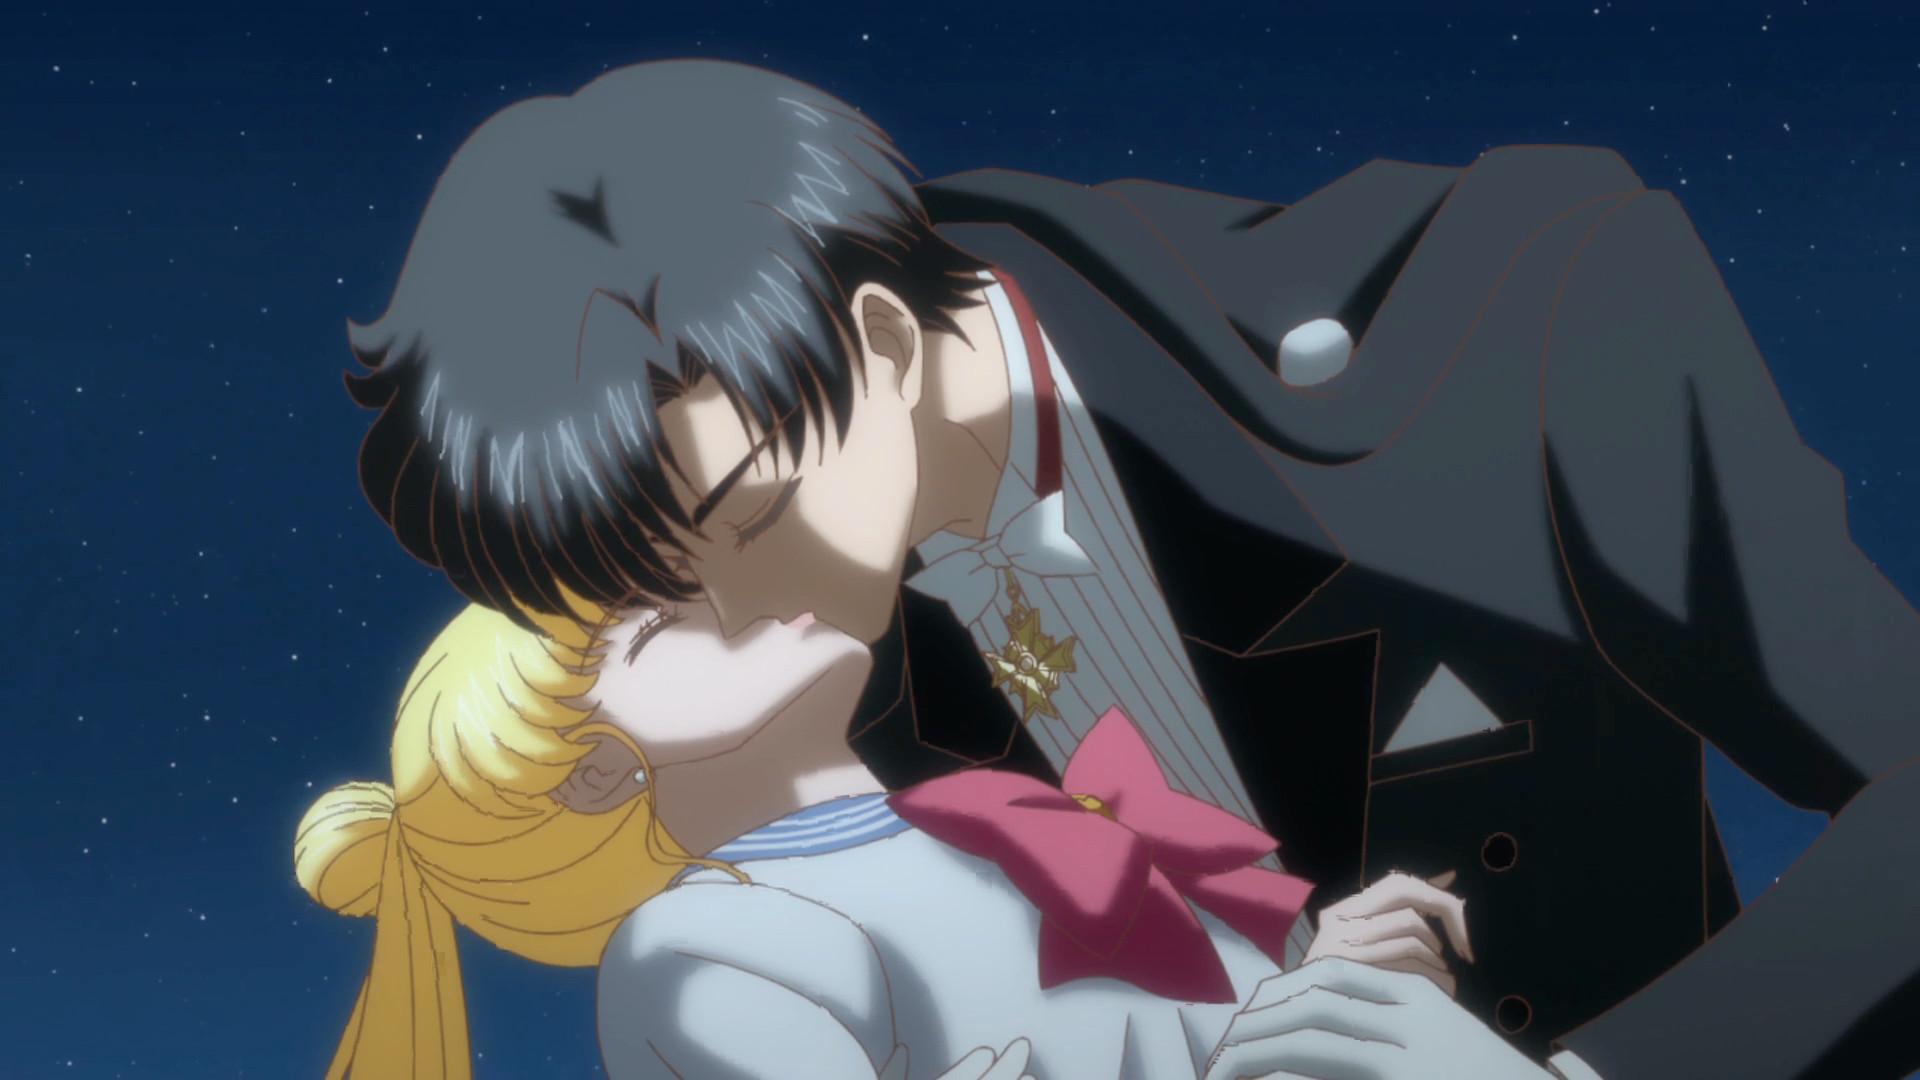 Sakura Falling Live Wallpaper Sailor Moon Crystal Act 14 Tuxedo Mask Kissing Usagi